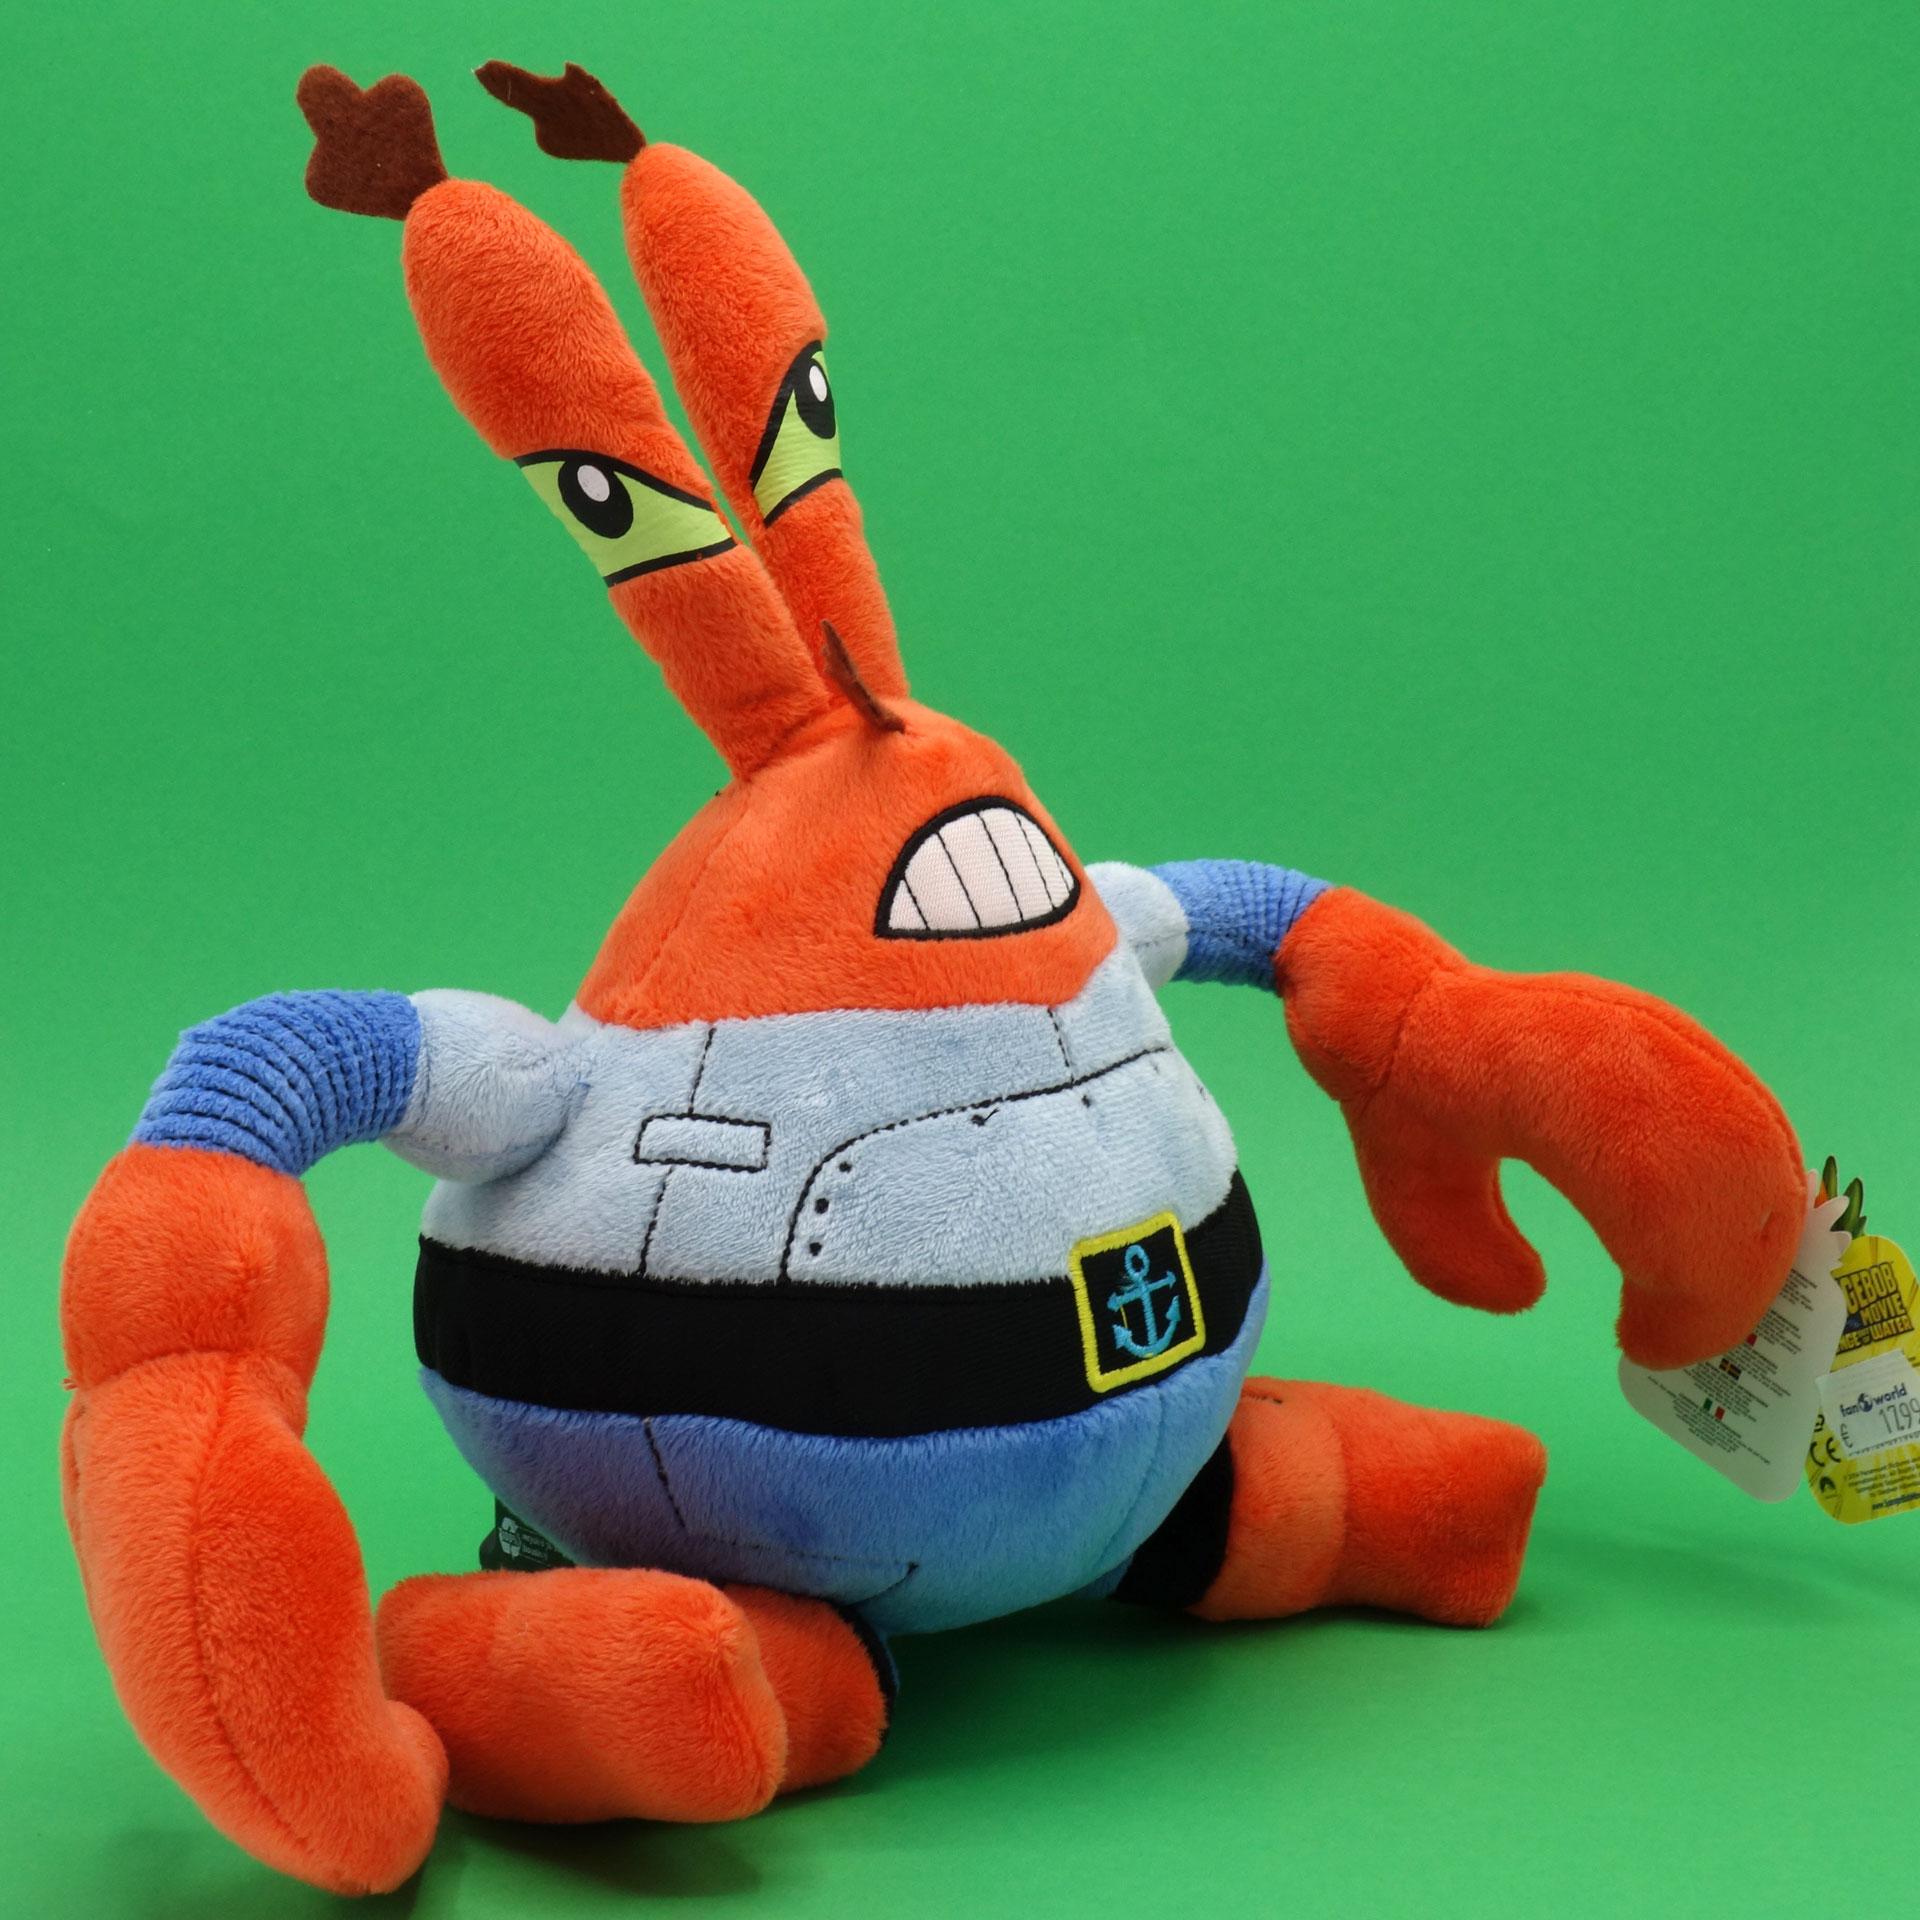 SpongeBob Mr. Krabs Plüsch